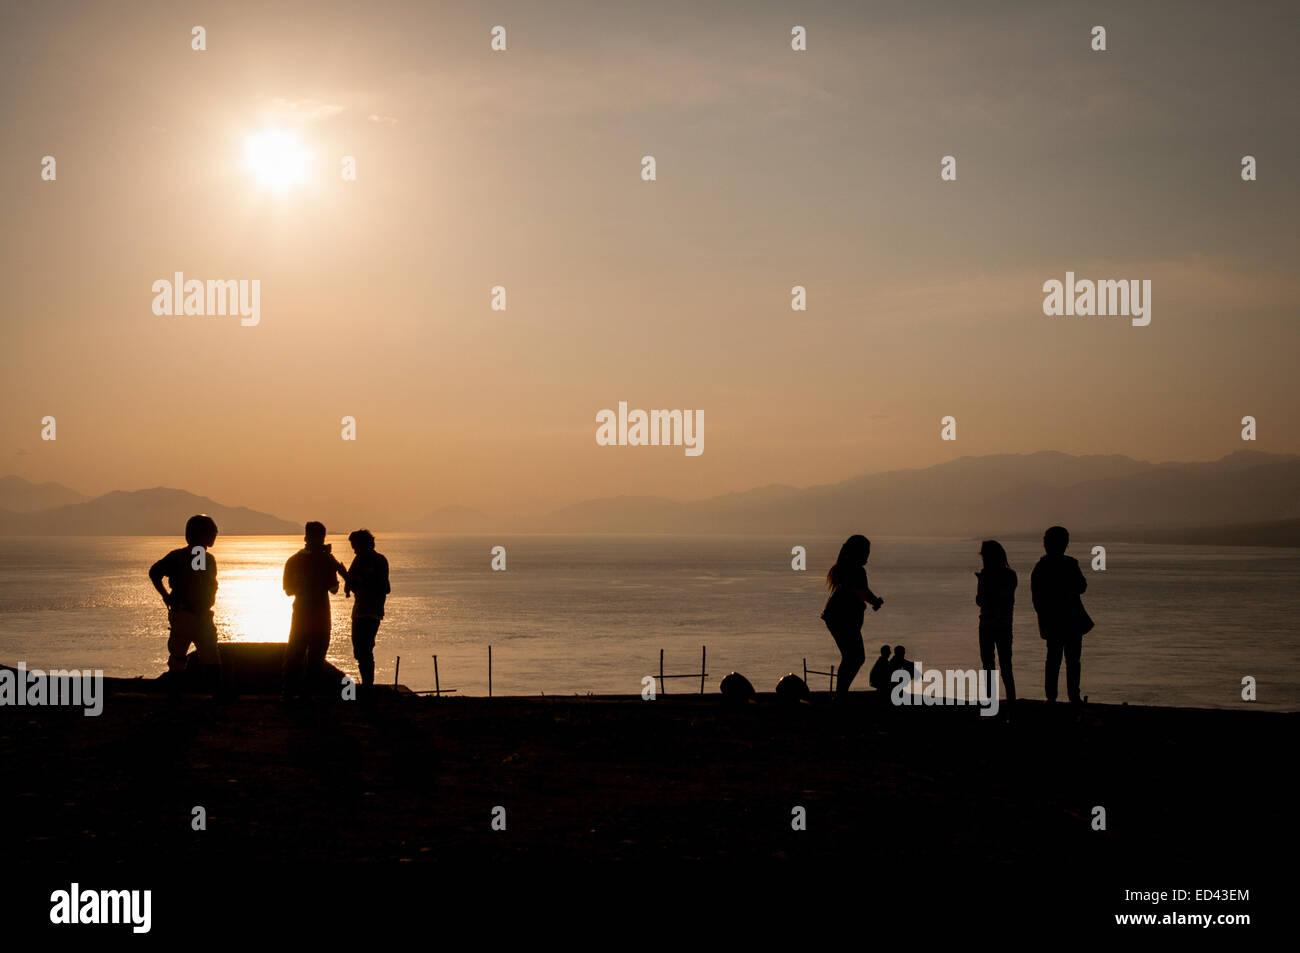 Local people silhouetted against a bright sky at Waijarang beach, Lembata Island, Indonesia. © Reynold Sumayku - Stock Image